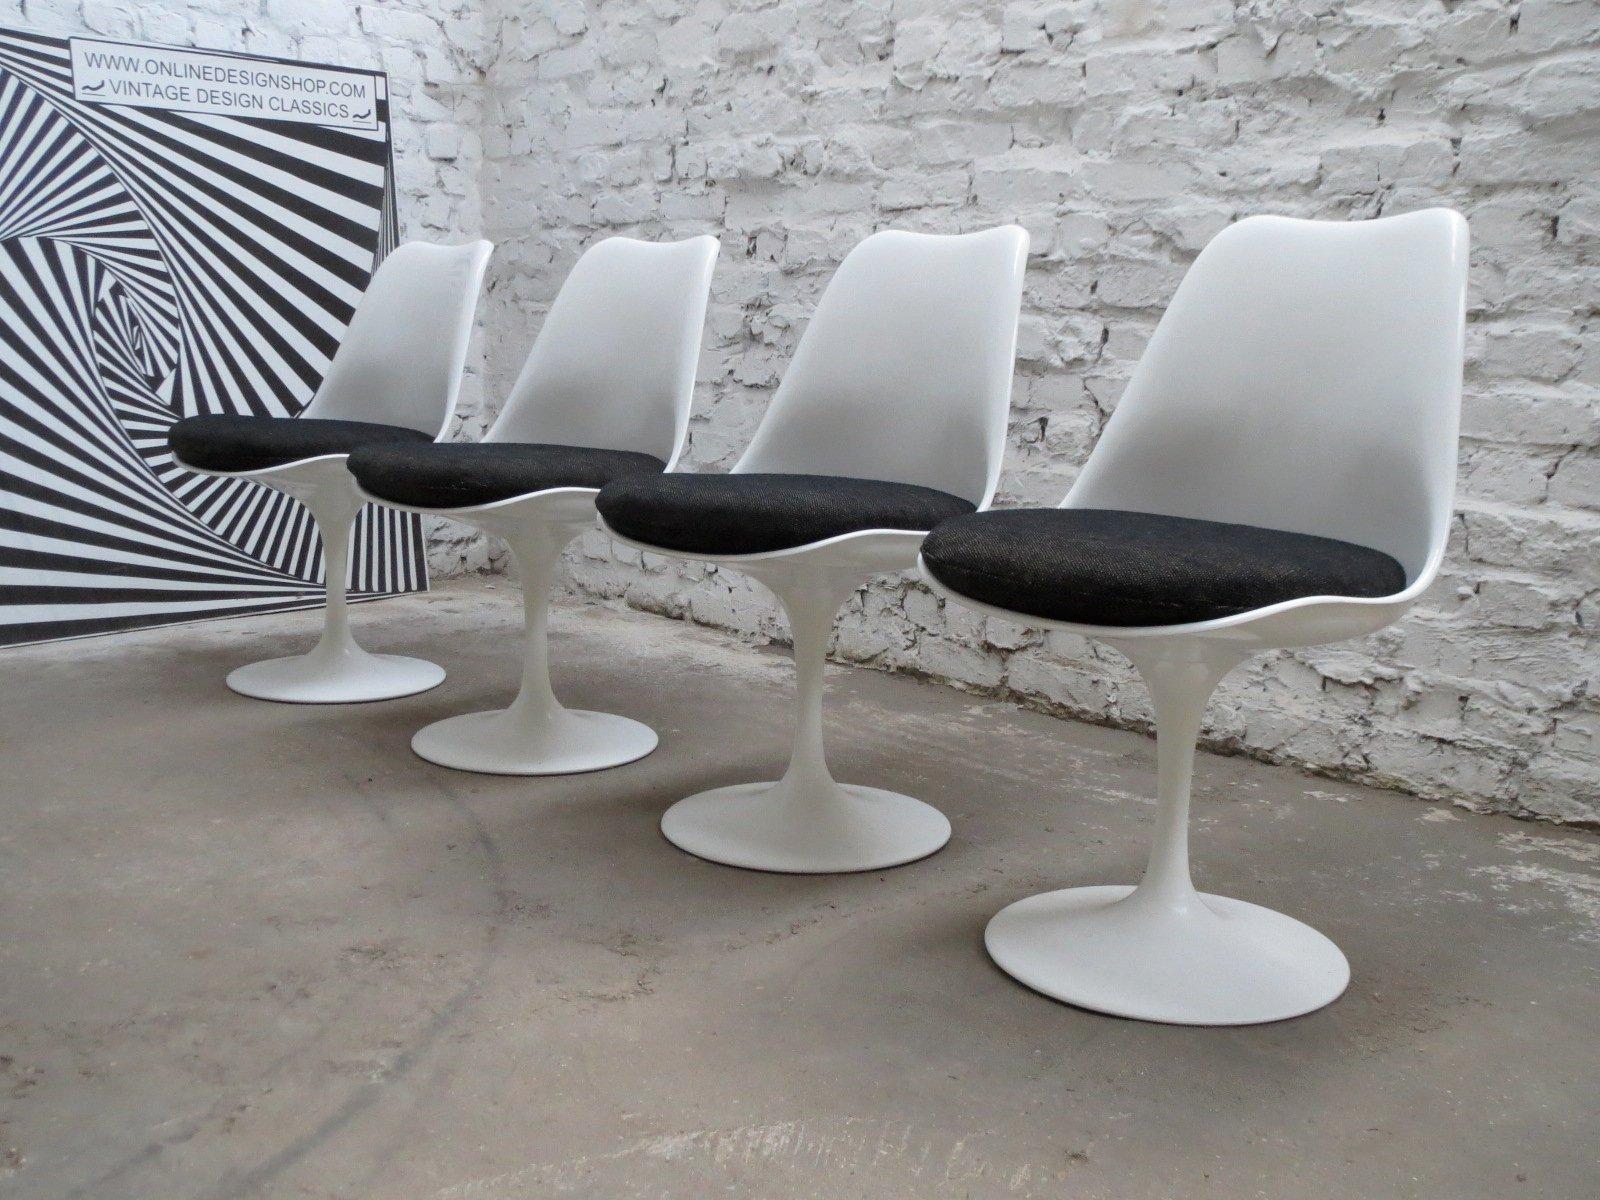 NonSwivel Tulip Chairs by Eero Saarinen for Knoll International